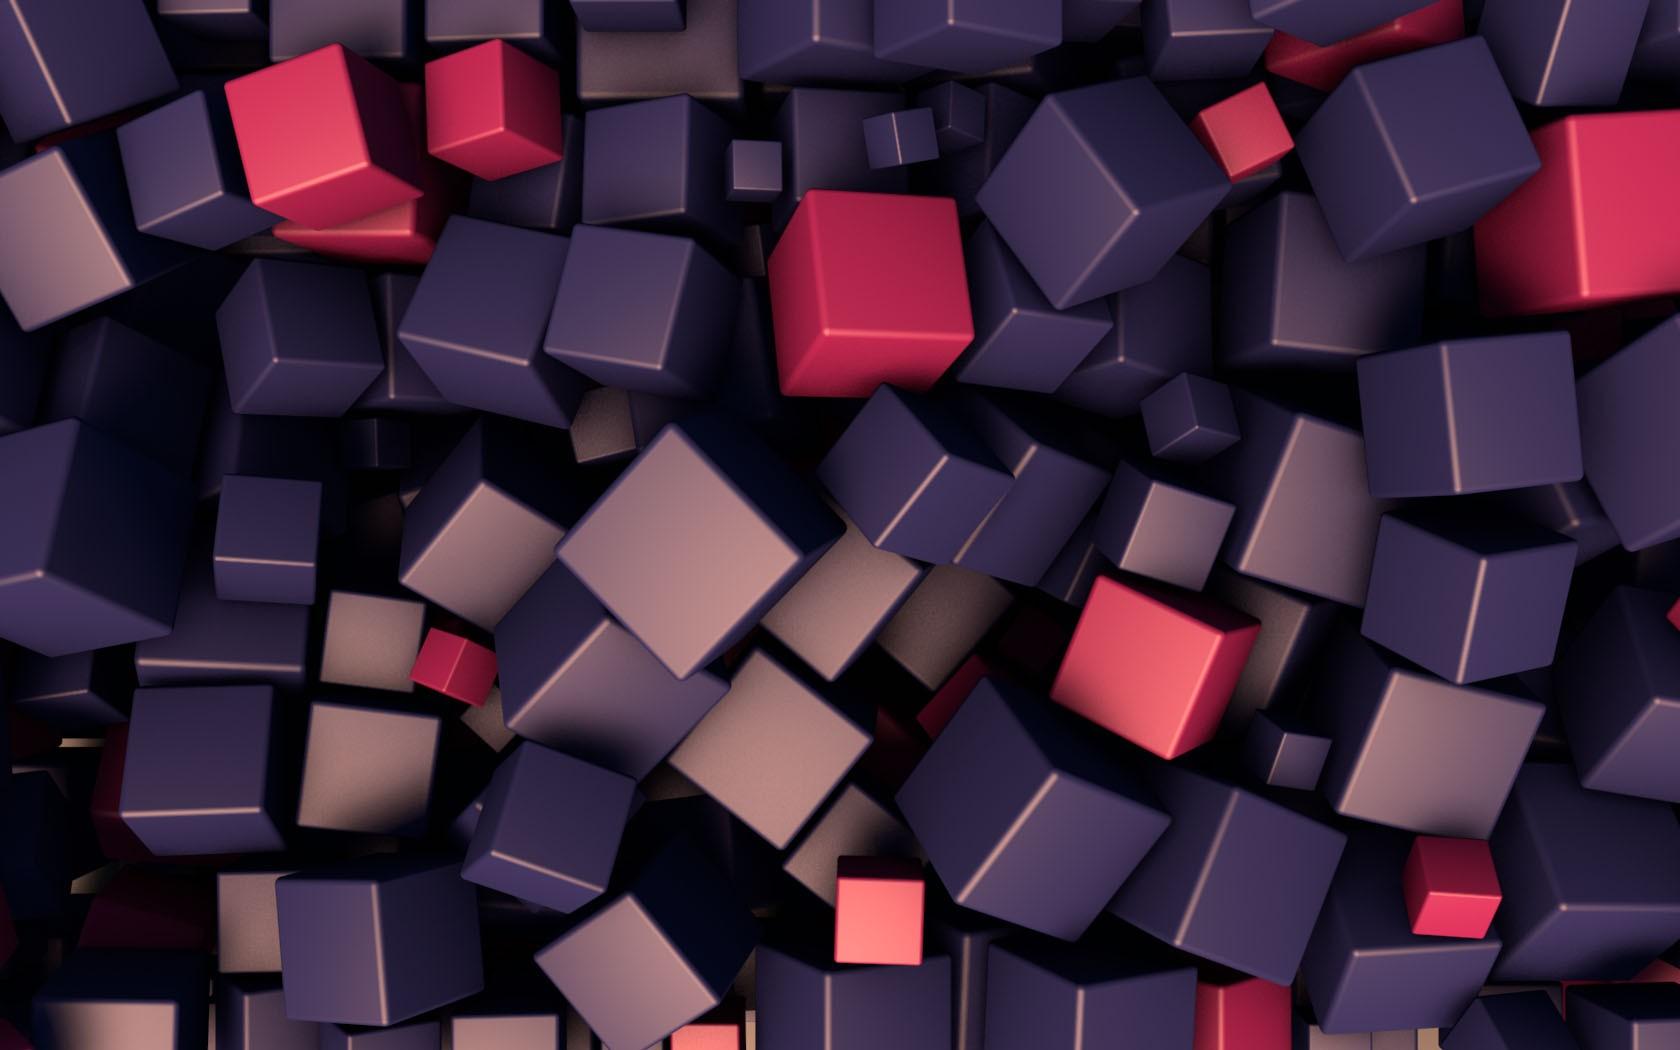 Cubes 3D Wallpaper 1680x1050 Cubes 3D 1680x1050